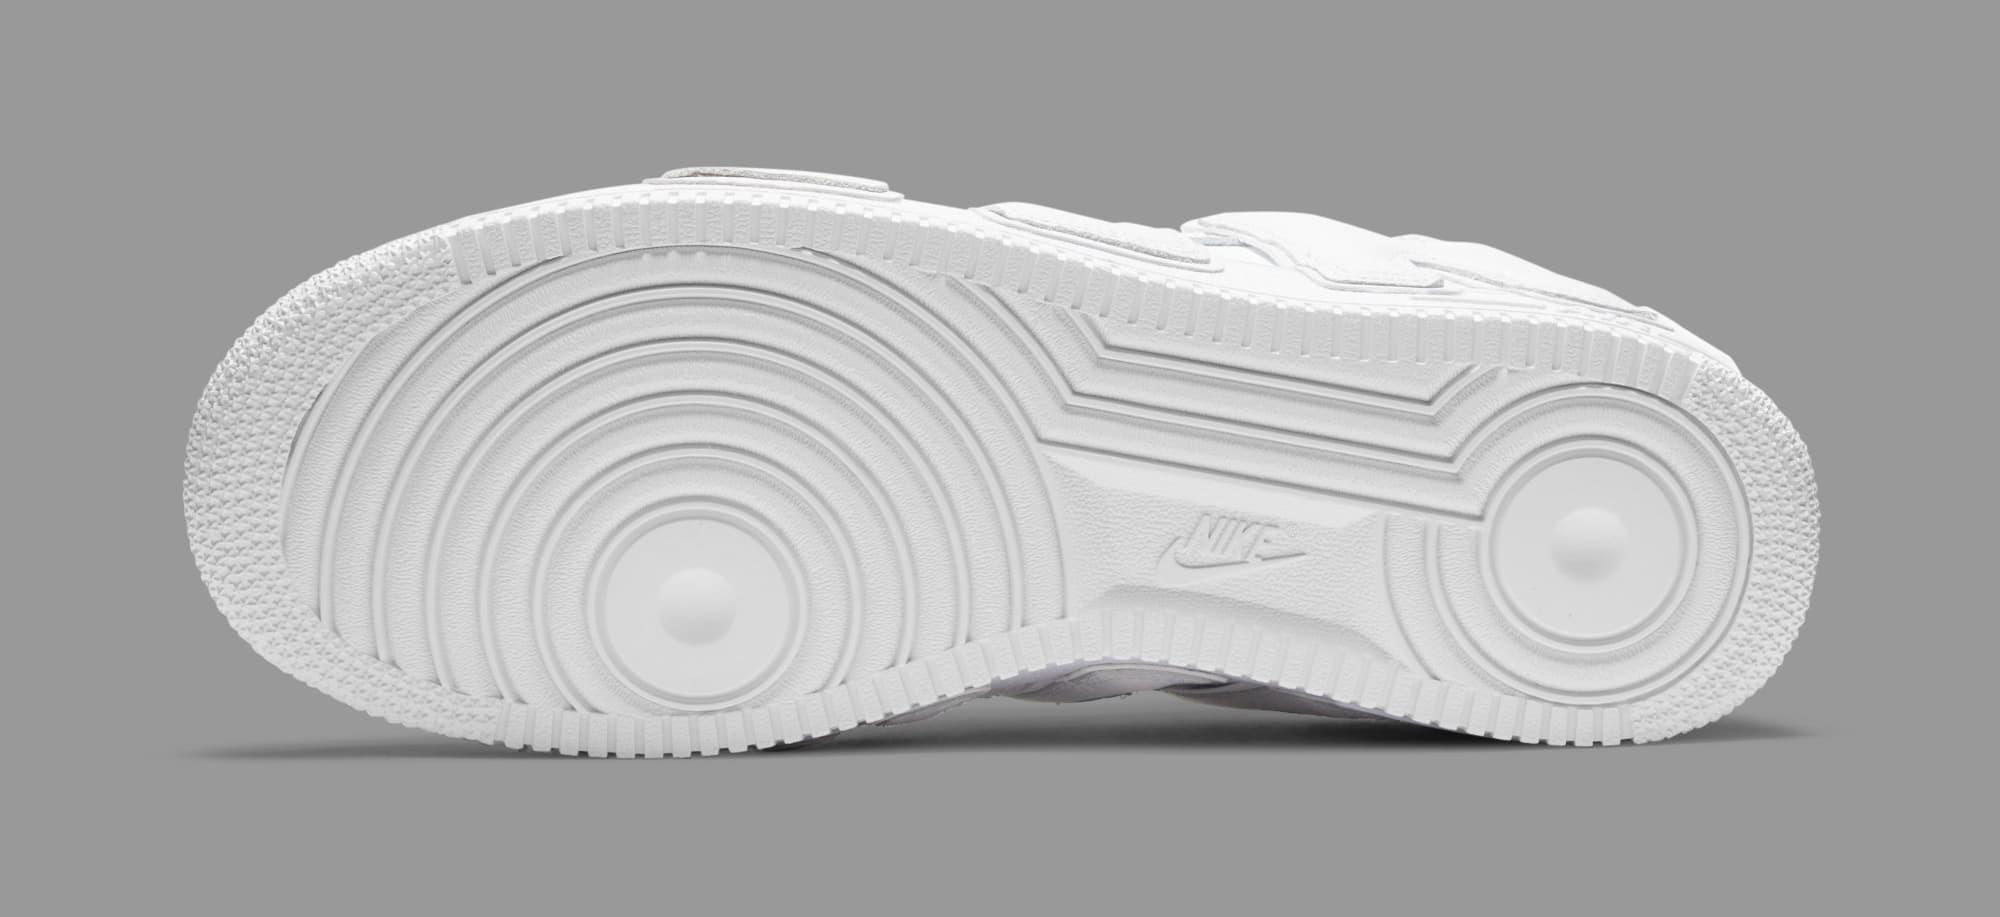 Cactus Plant Flea Market x Nike Air Force 1 Low 'White' DD7050-100 Outsole